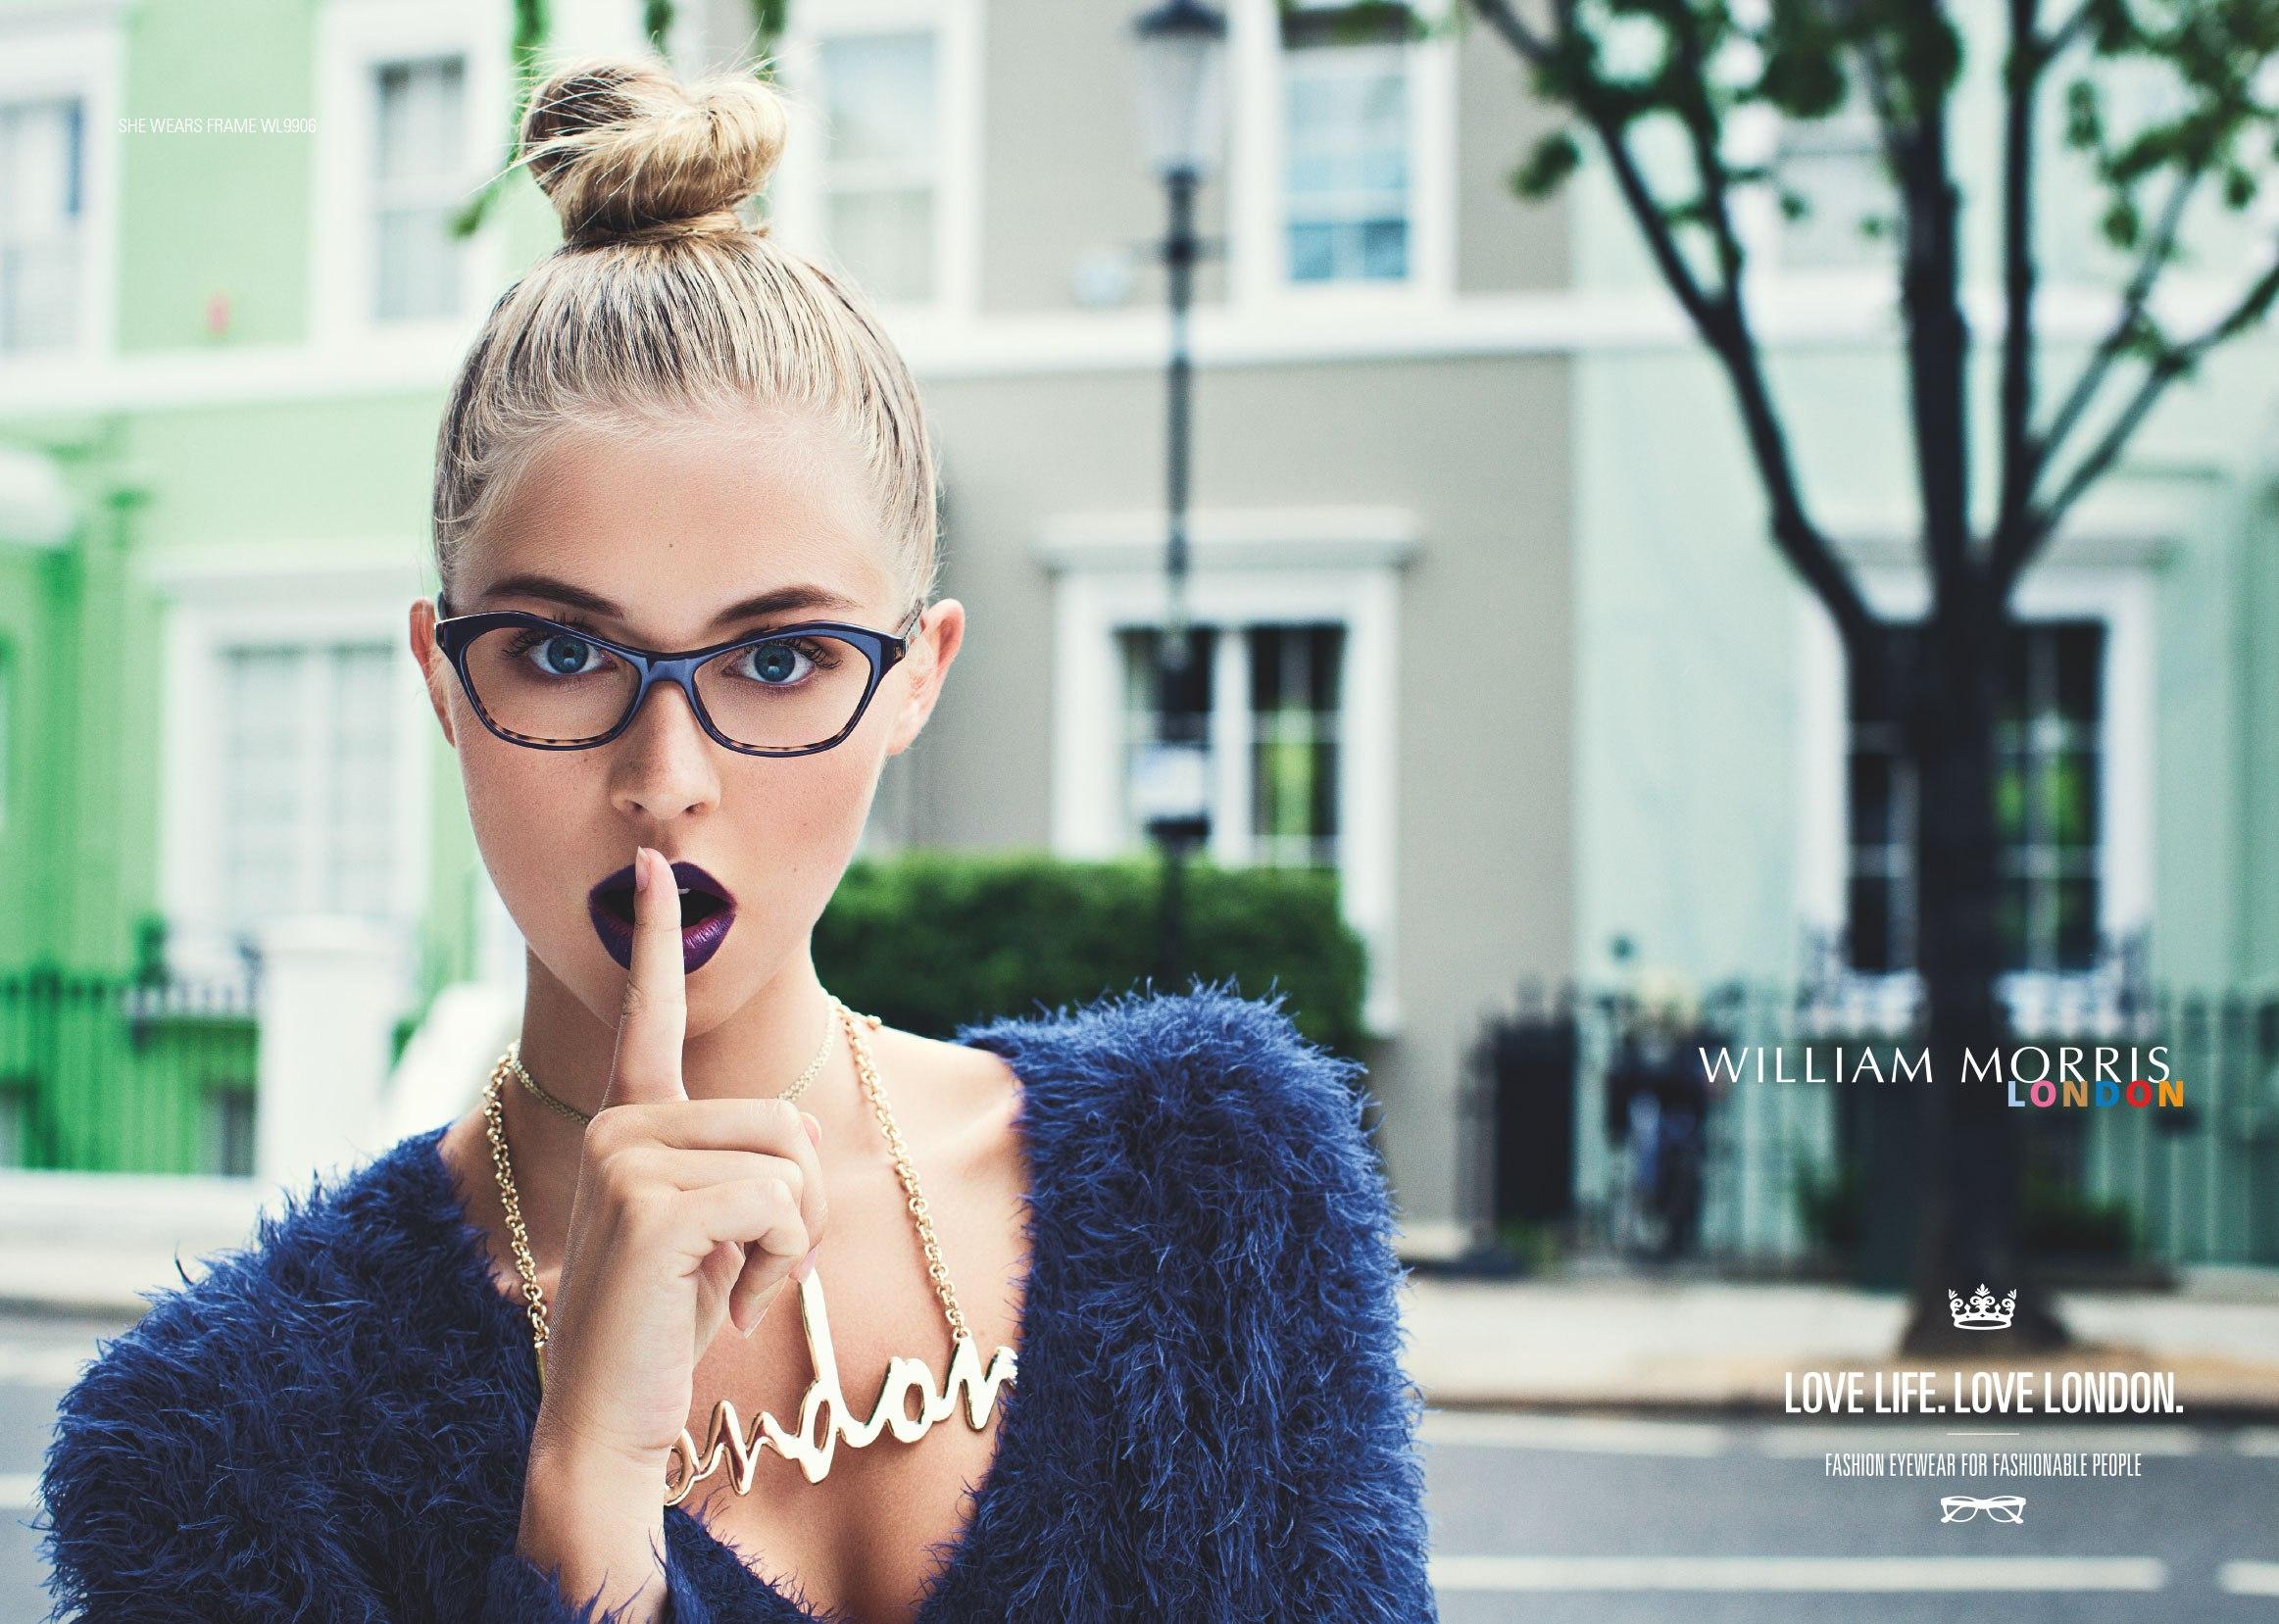 william-morris-london-2013-campaign-glasses-eyewear-2